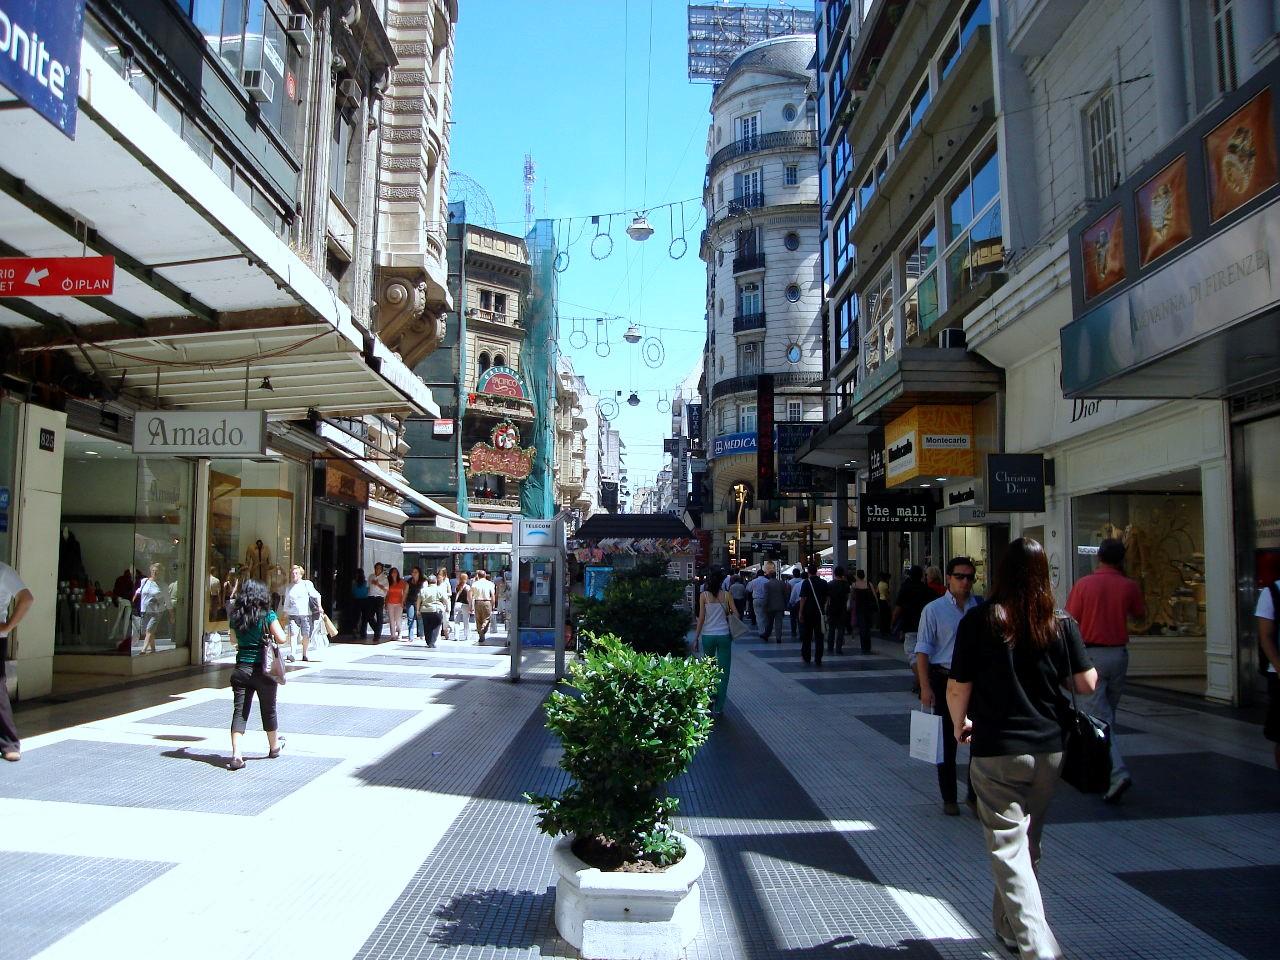 Argentina-florida-street-blue-market